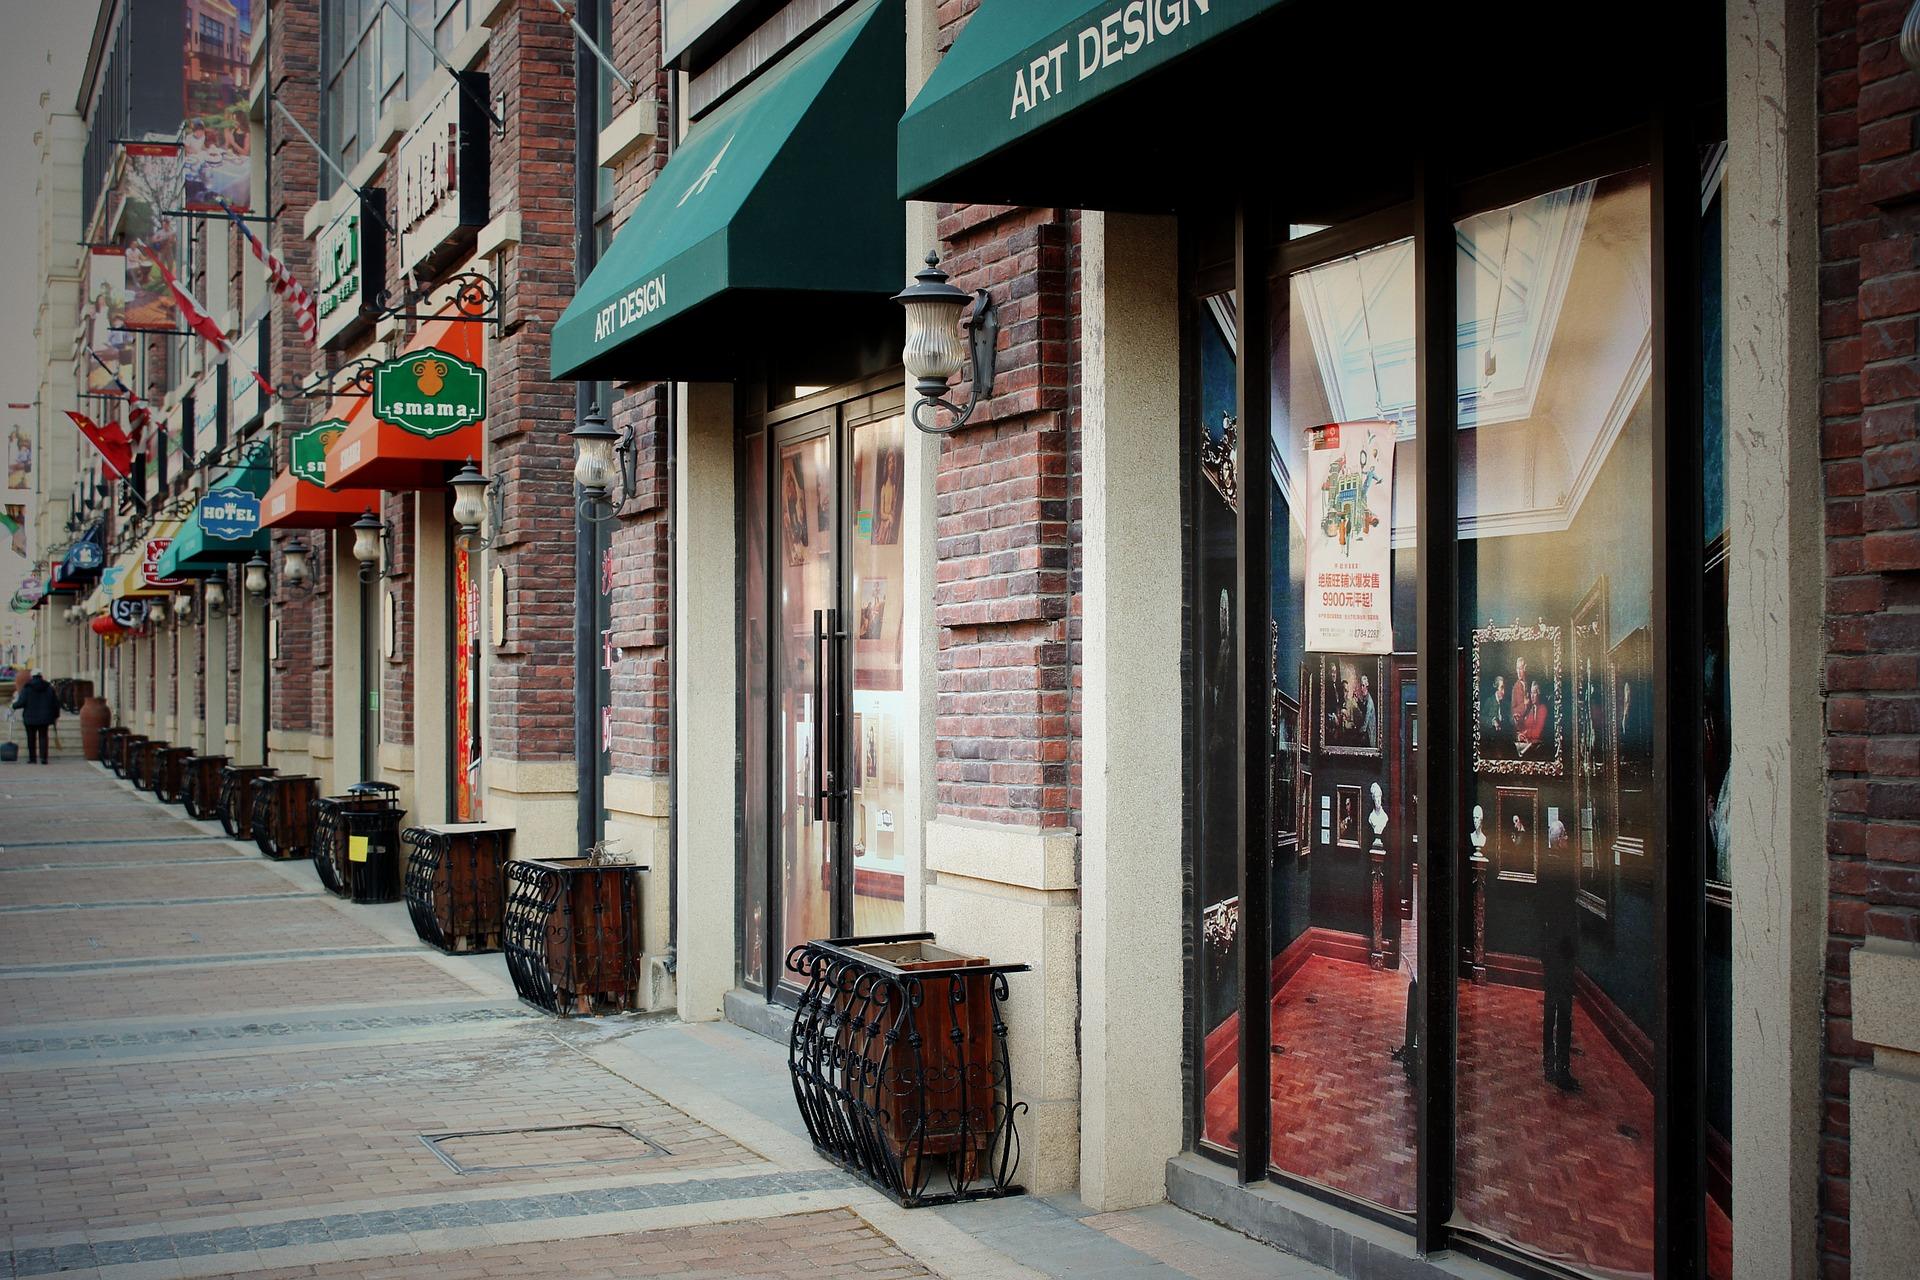 21 Consumer Discretionary ETFs for Economy Growth